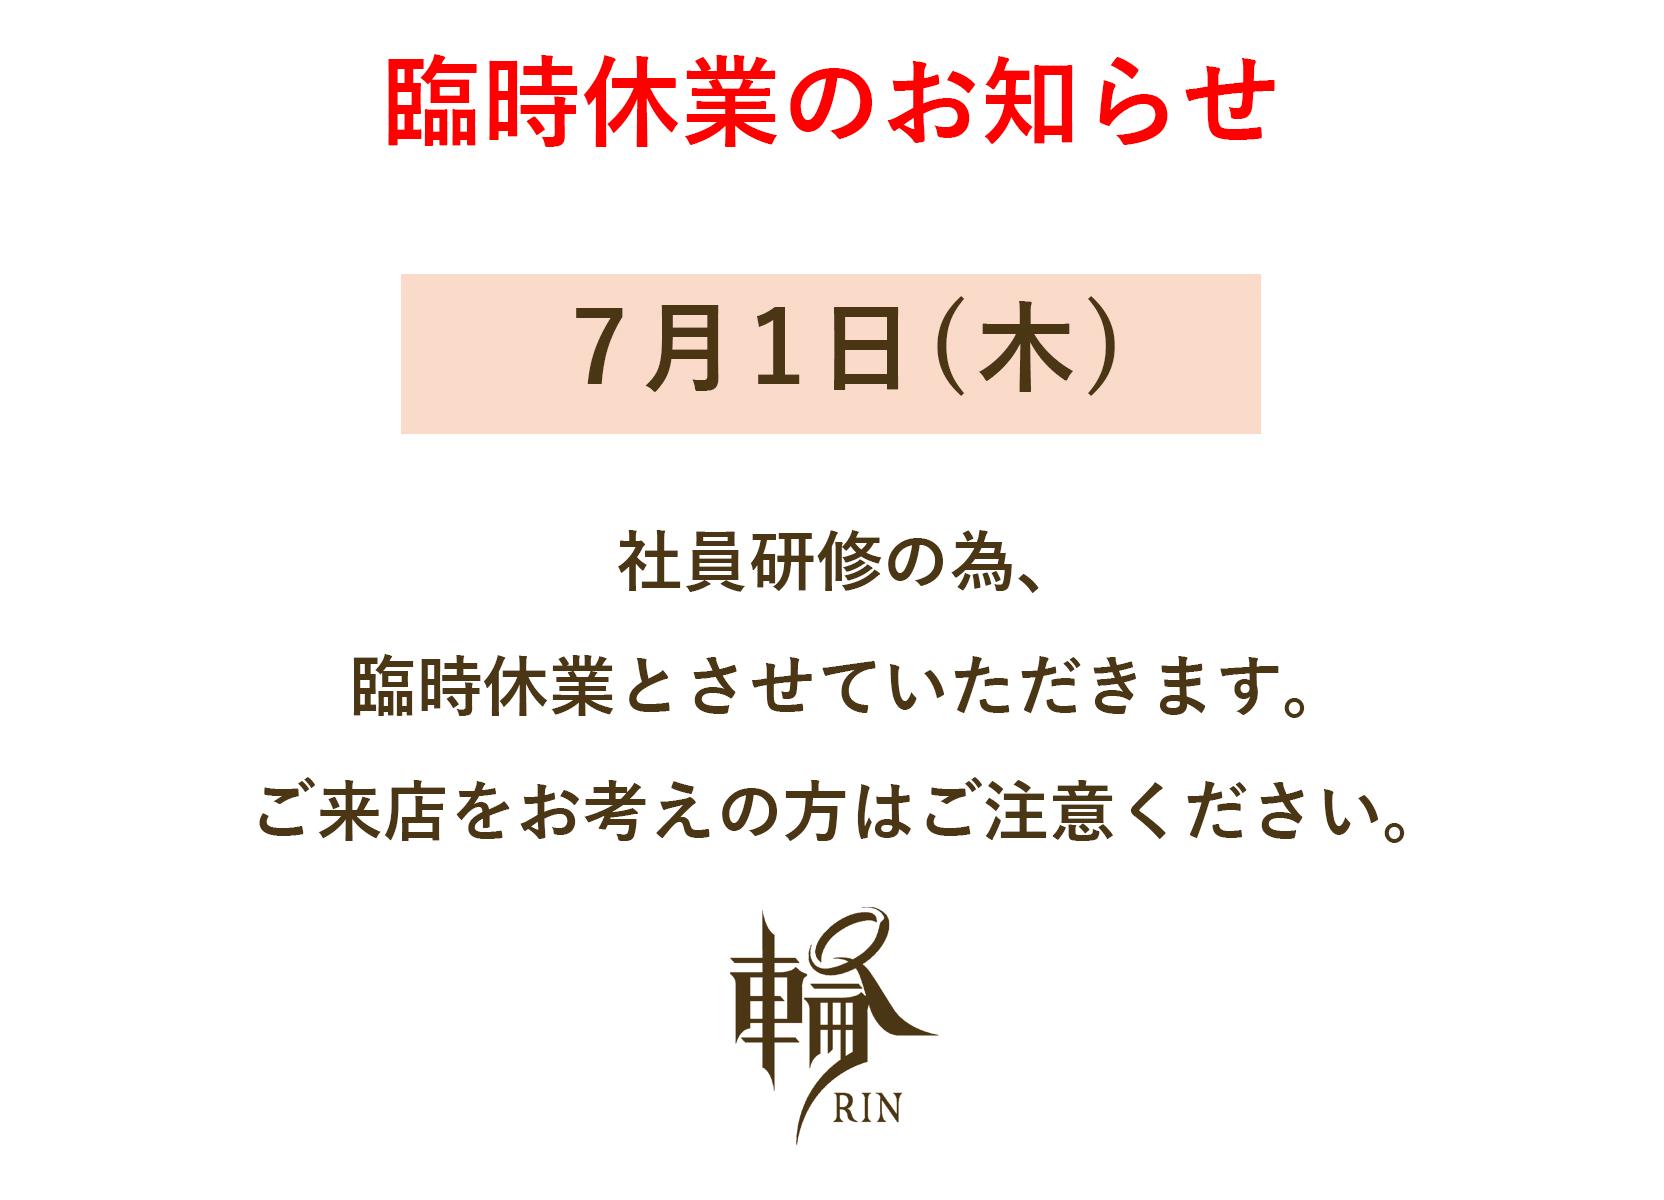 rin_高崎shop